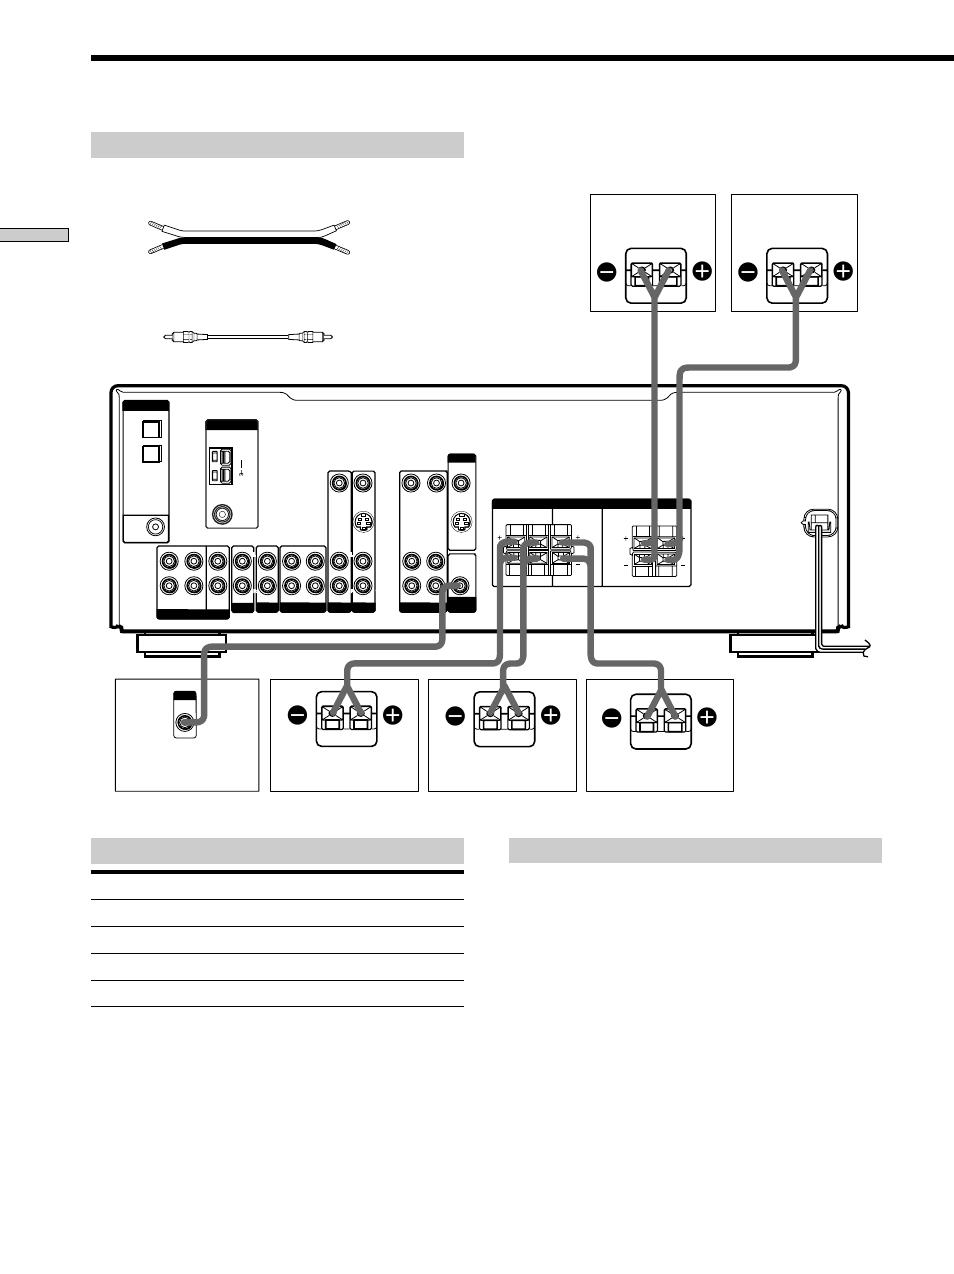 Speaker system hookup 12, Speaker system hookup, Terminals